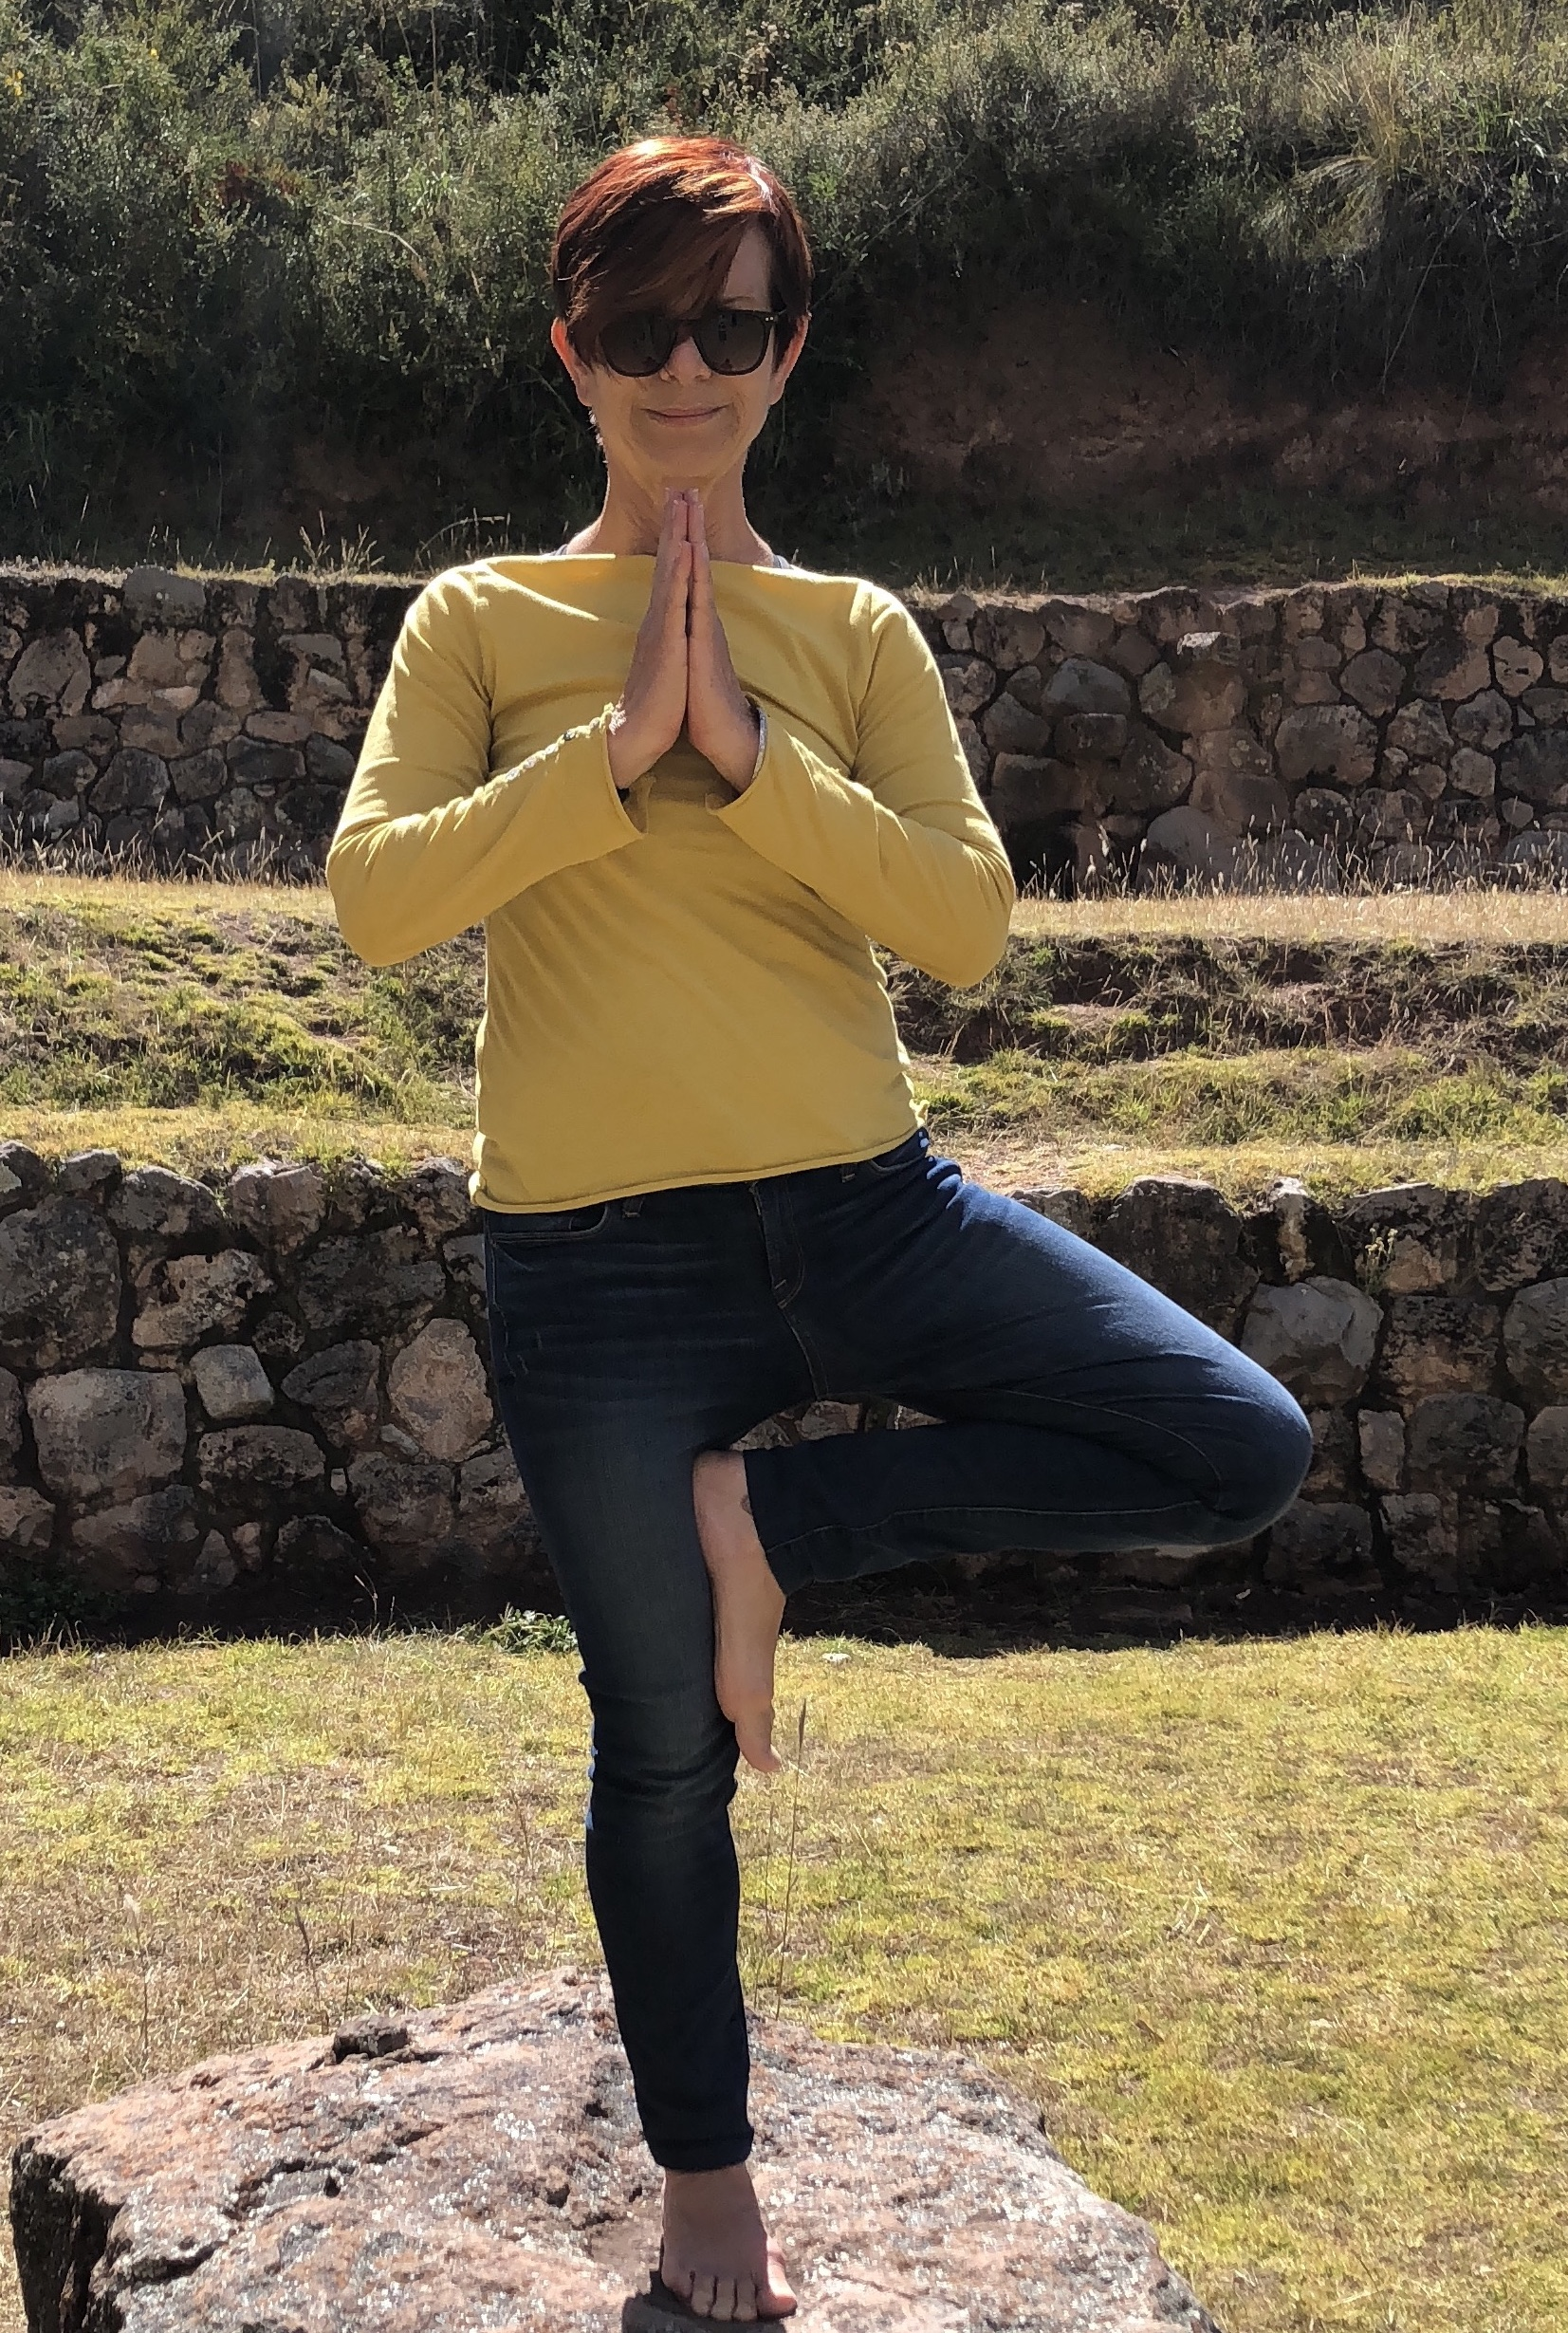 Kati (Ajeet Dev Kaur) Gimes